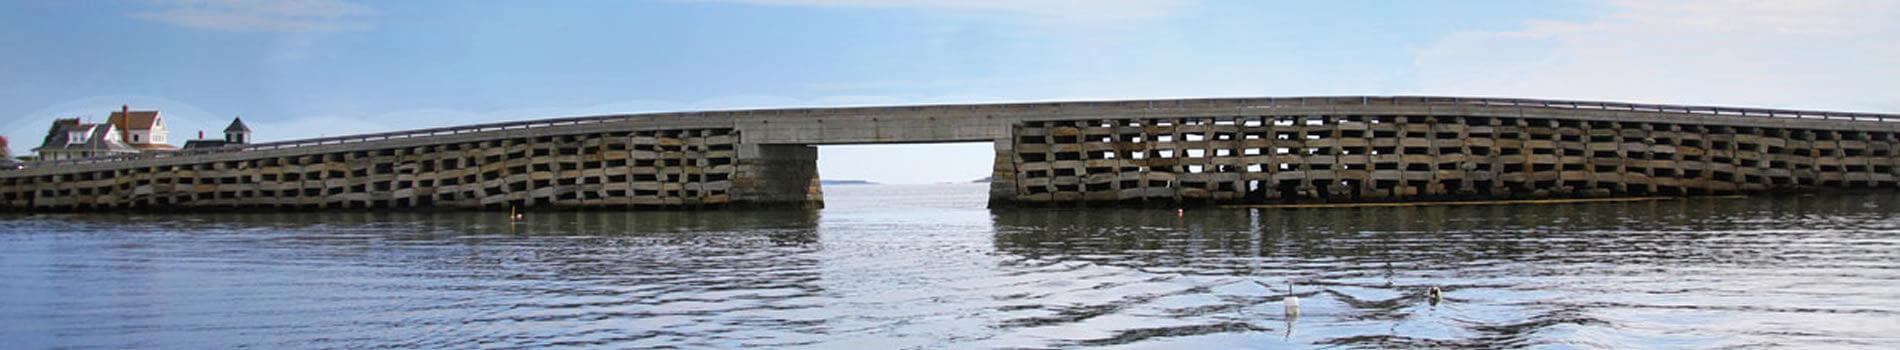 Image is of the cribstone bridge.